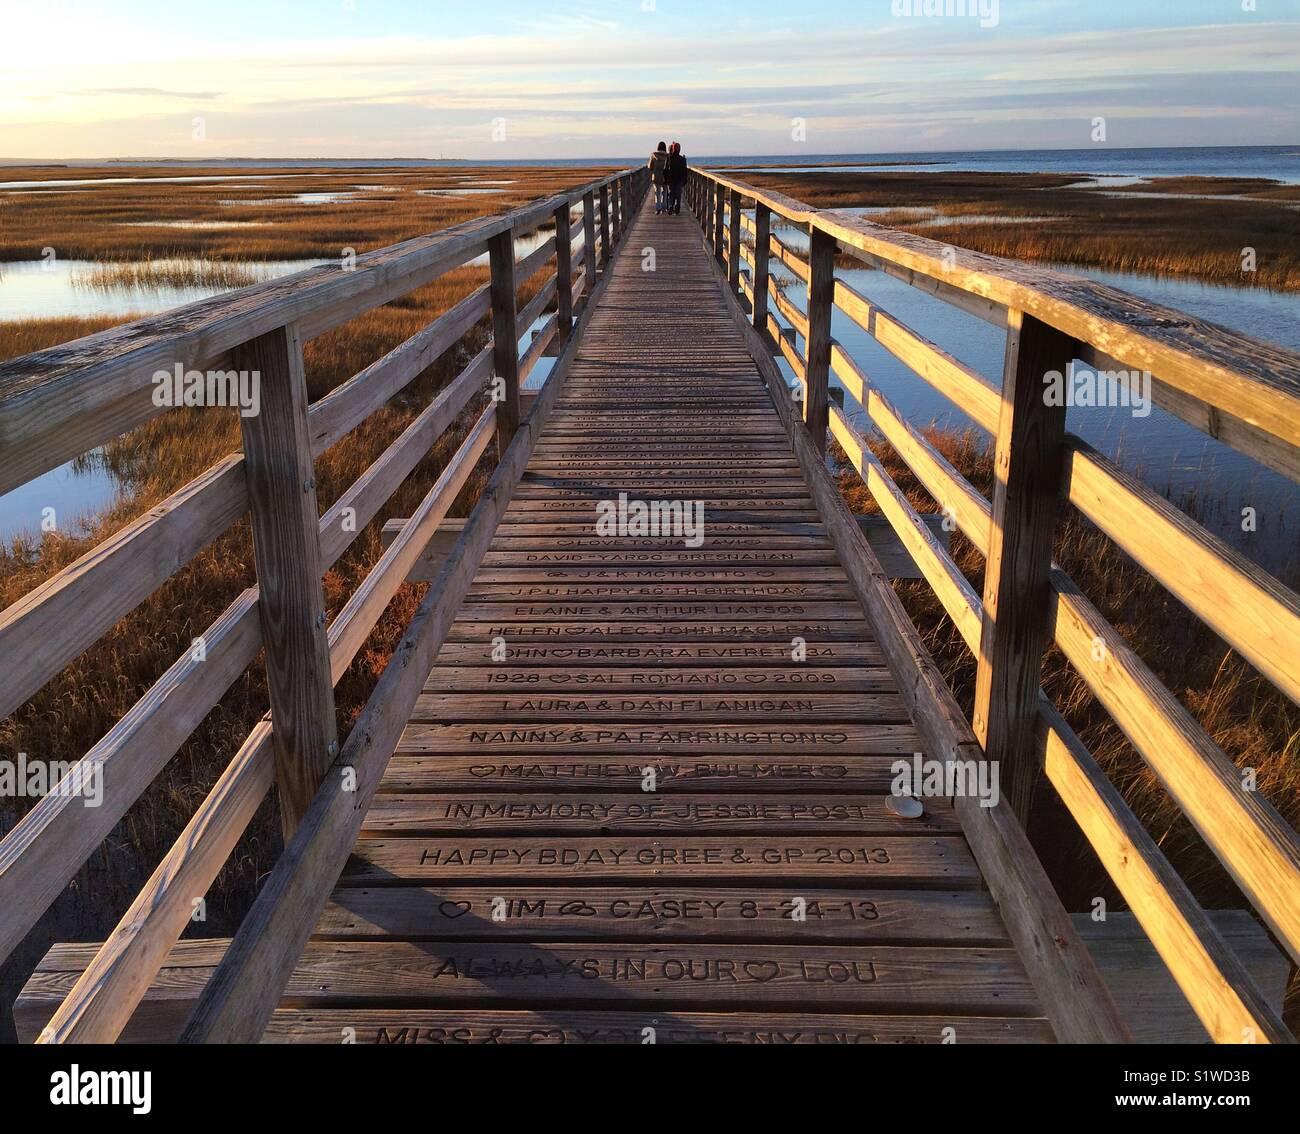 Boardwalk, Grays Beach, Yarmouth Port, Cape Cod, Massachusetts - Stock Image